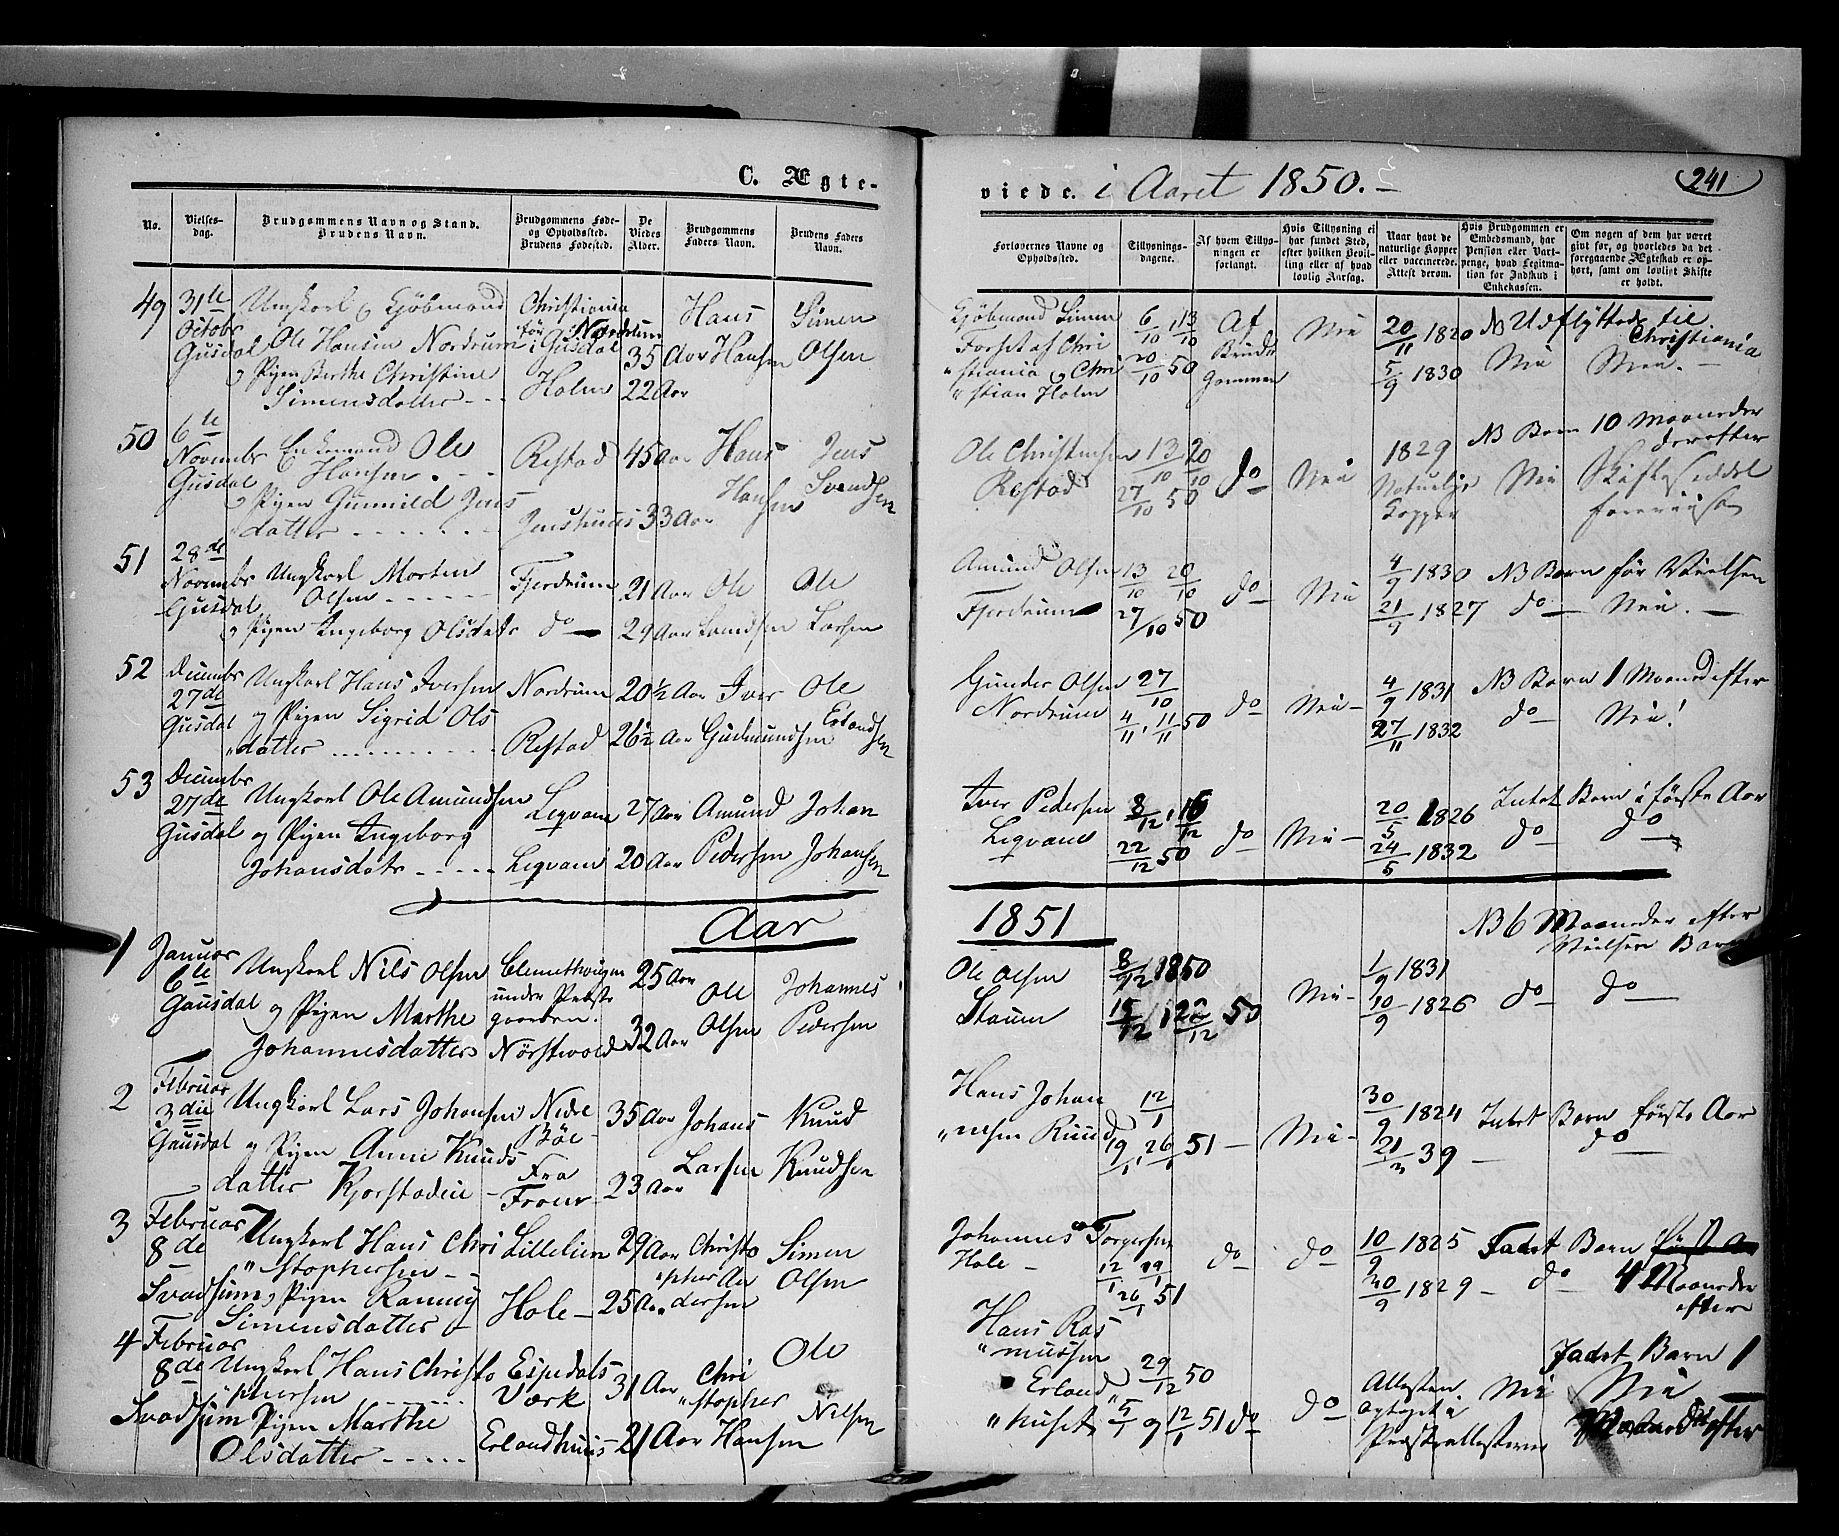 SAH, Gausdal prestekontor, Ministerialbok nr. 8, 1850-1861, s. 241